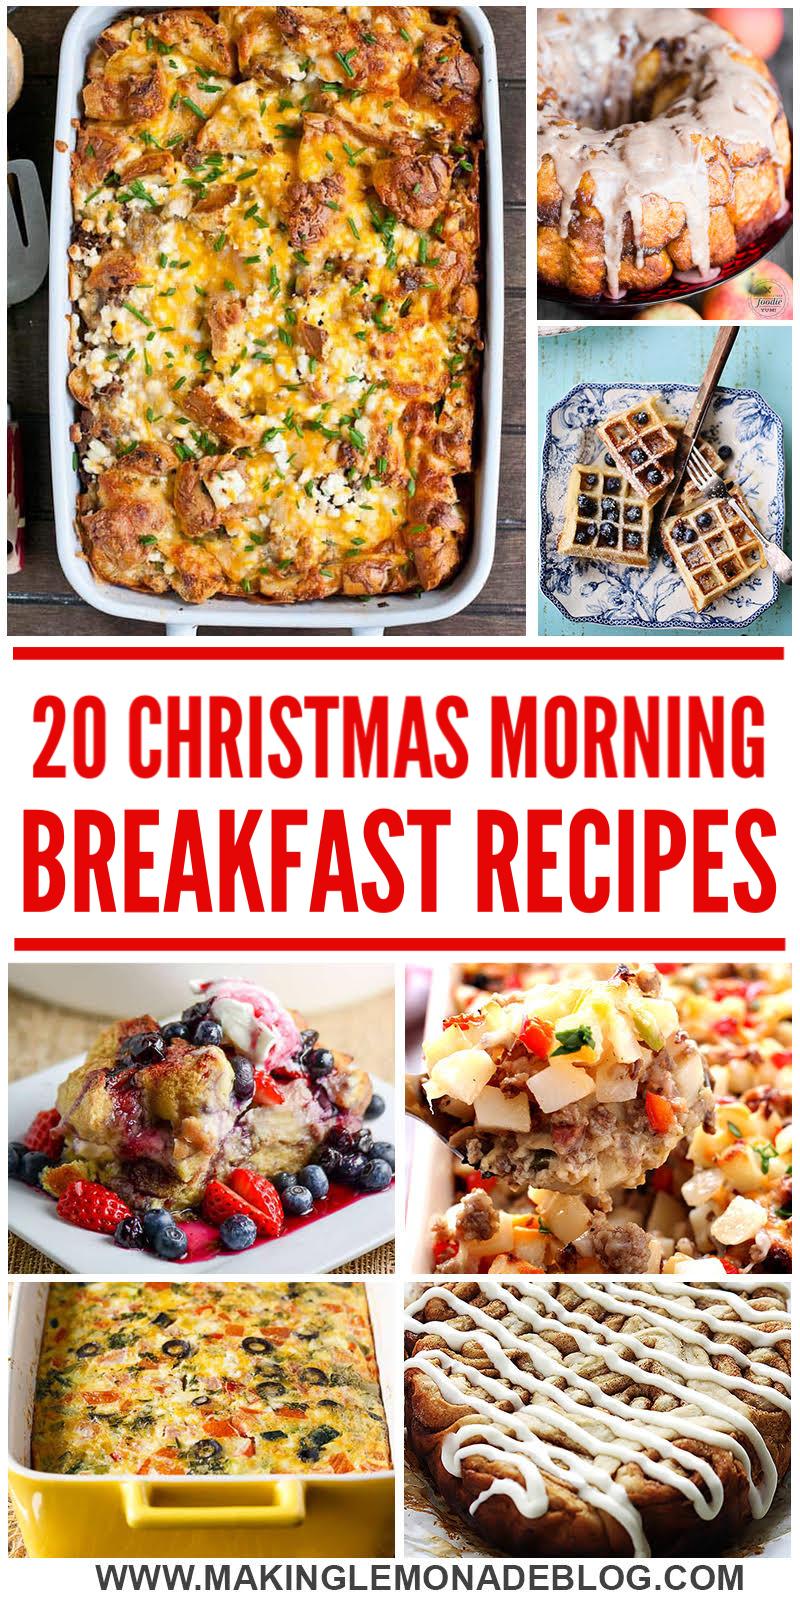 20 Delicious Christmas Breakfast Recipes Making Lemonade